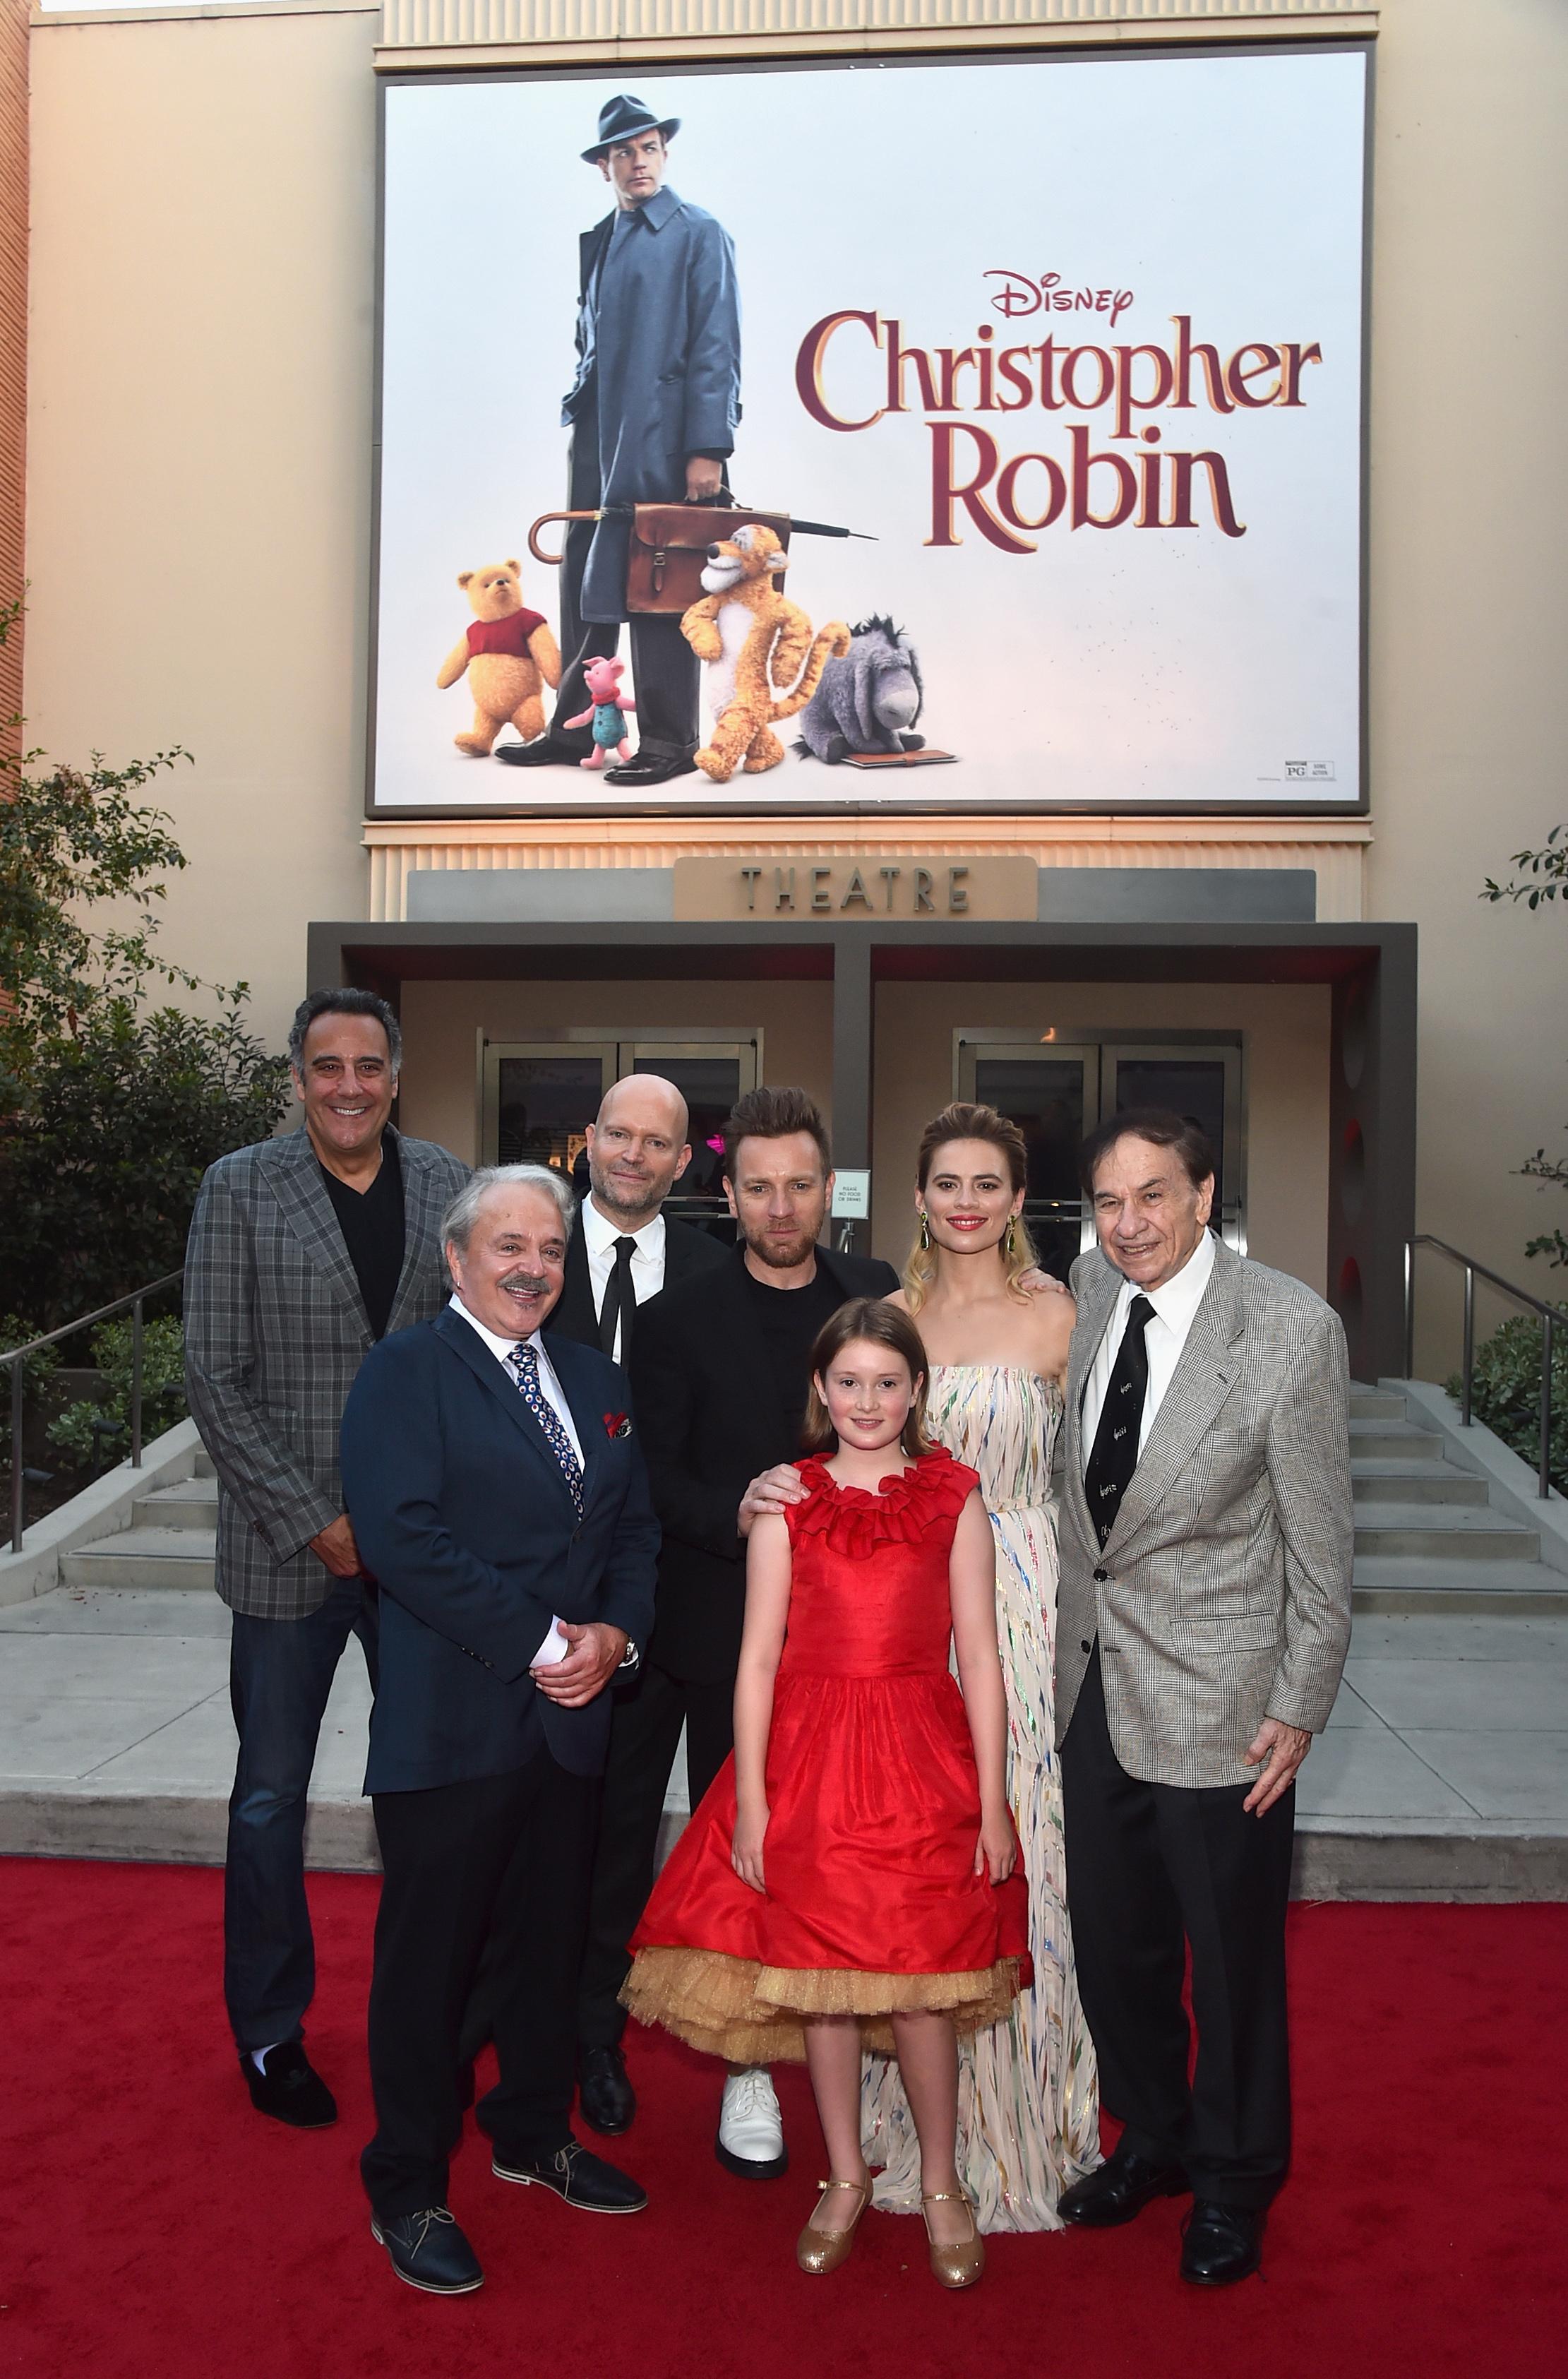 Christopher Robin Movie Premier Ewan McGregor Hayley Atwell Bronte Carmichael